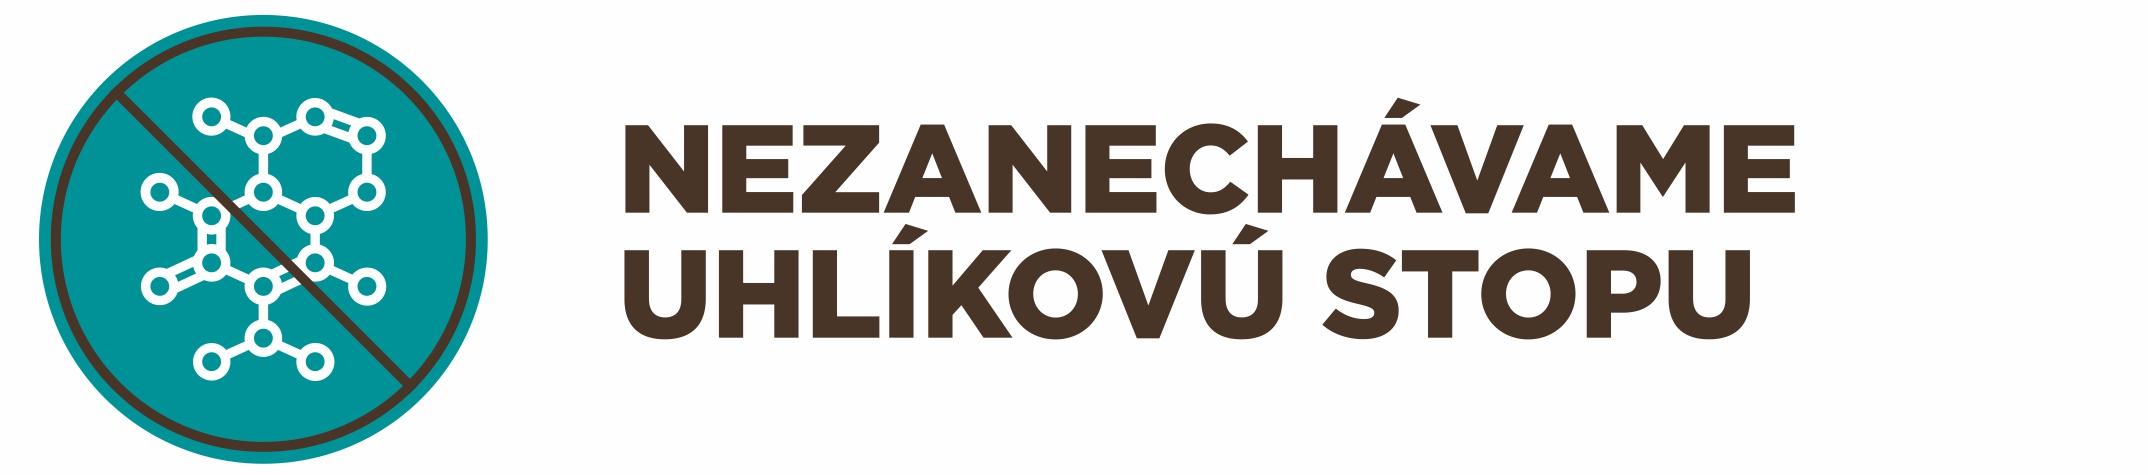 label_nezanechavame_uhlikovu_stopu